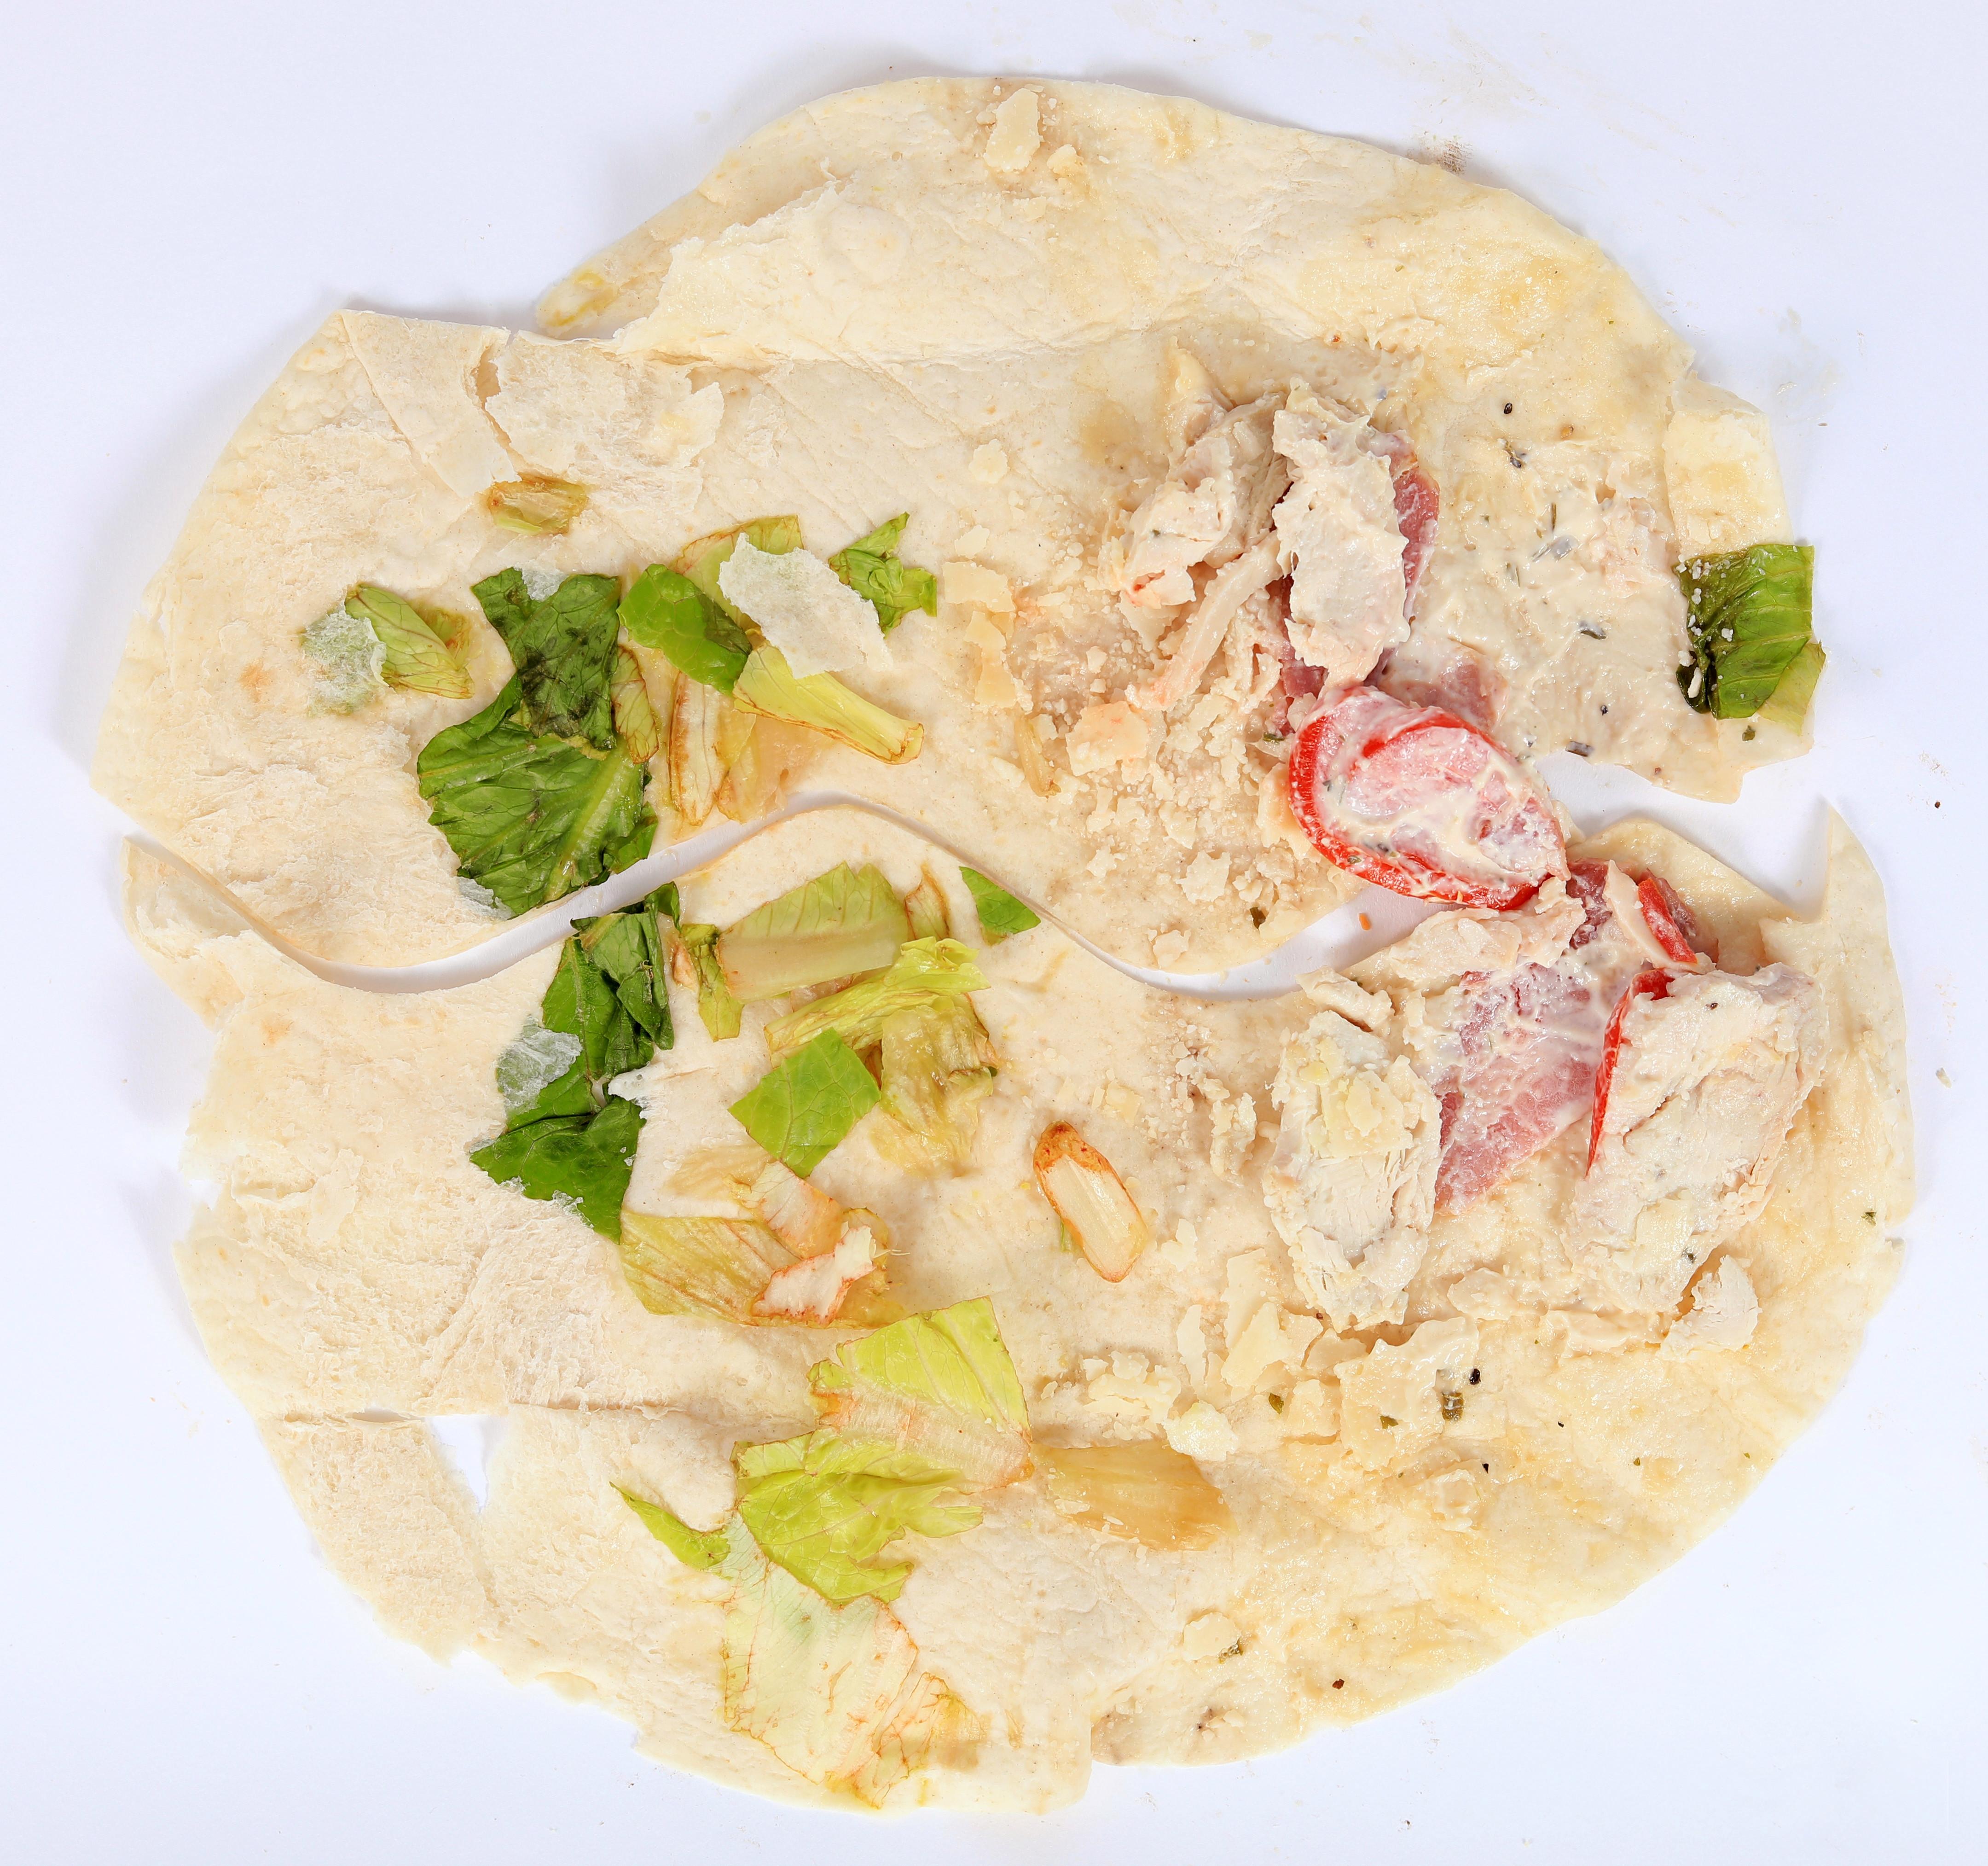 Waitrose: Chicken & Bacon Caesar